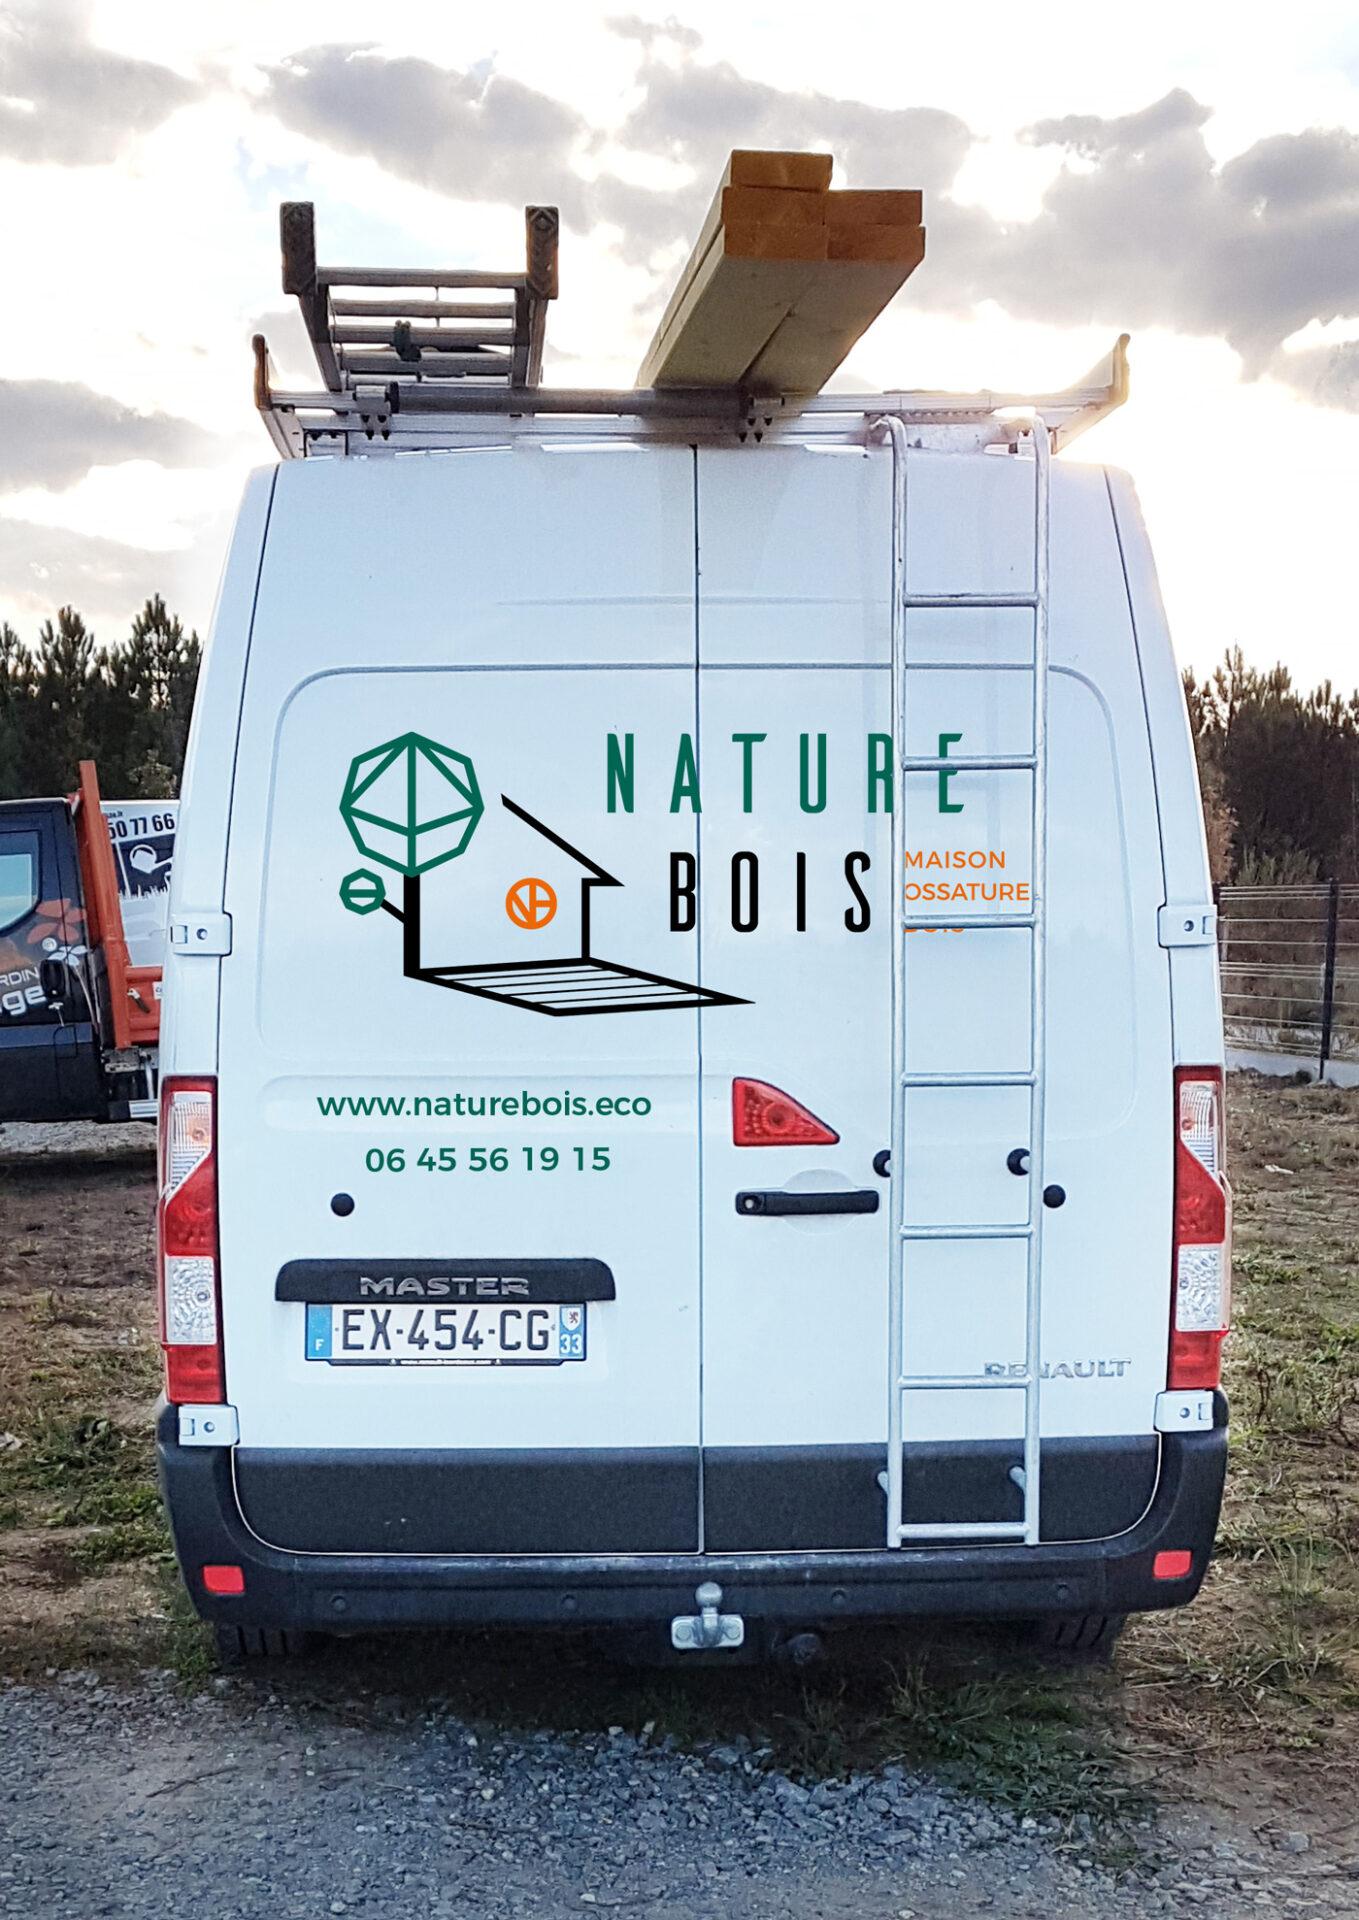 NATURE BOIS VEHICULE2